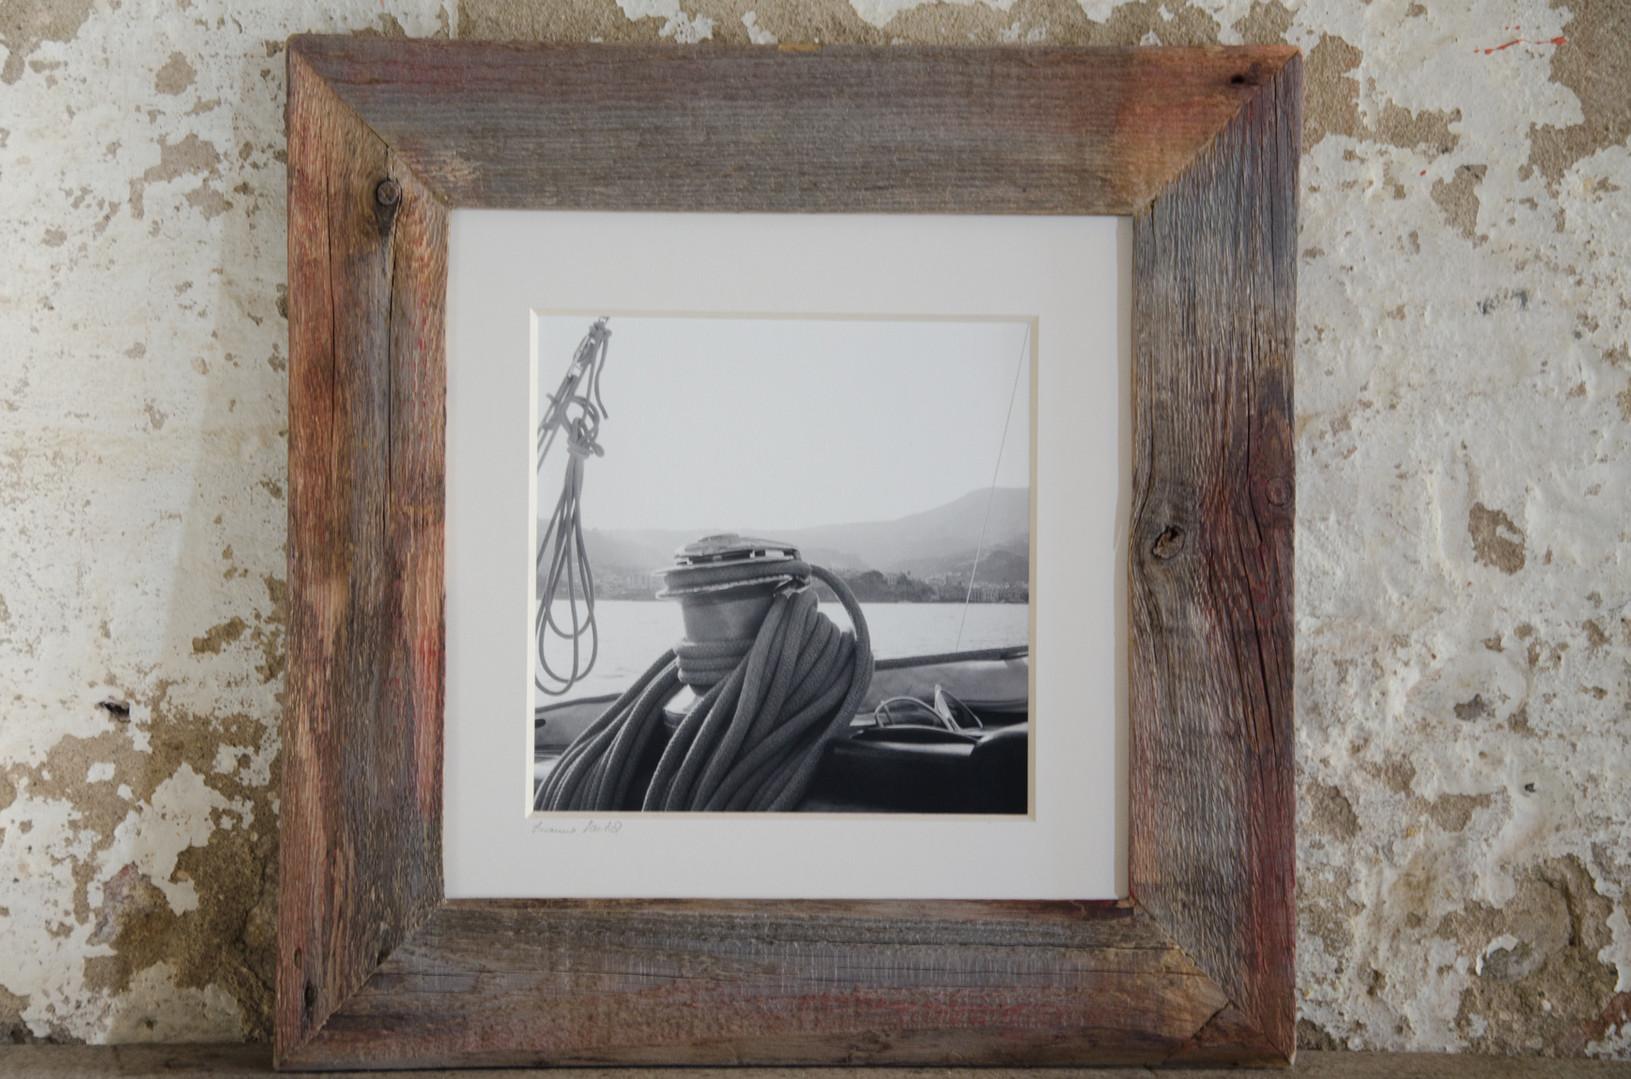 05 Seaside - Susanne Paetsch photo